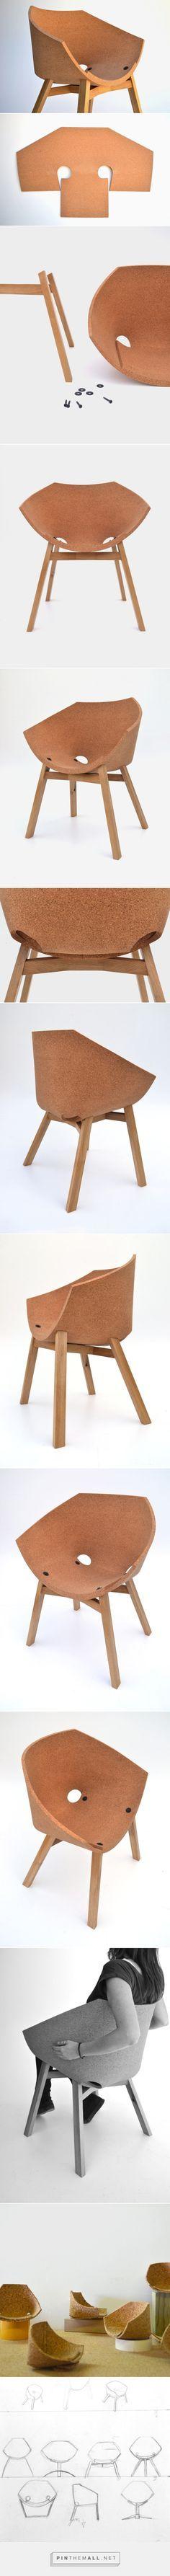 Corkigami Chair by Carlos Ortega Design - Design Milk - created via http://pinthemall.net